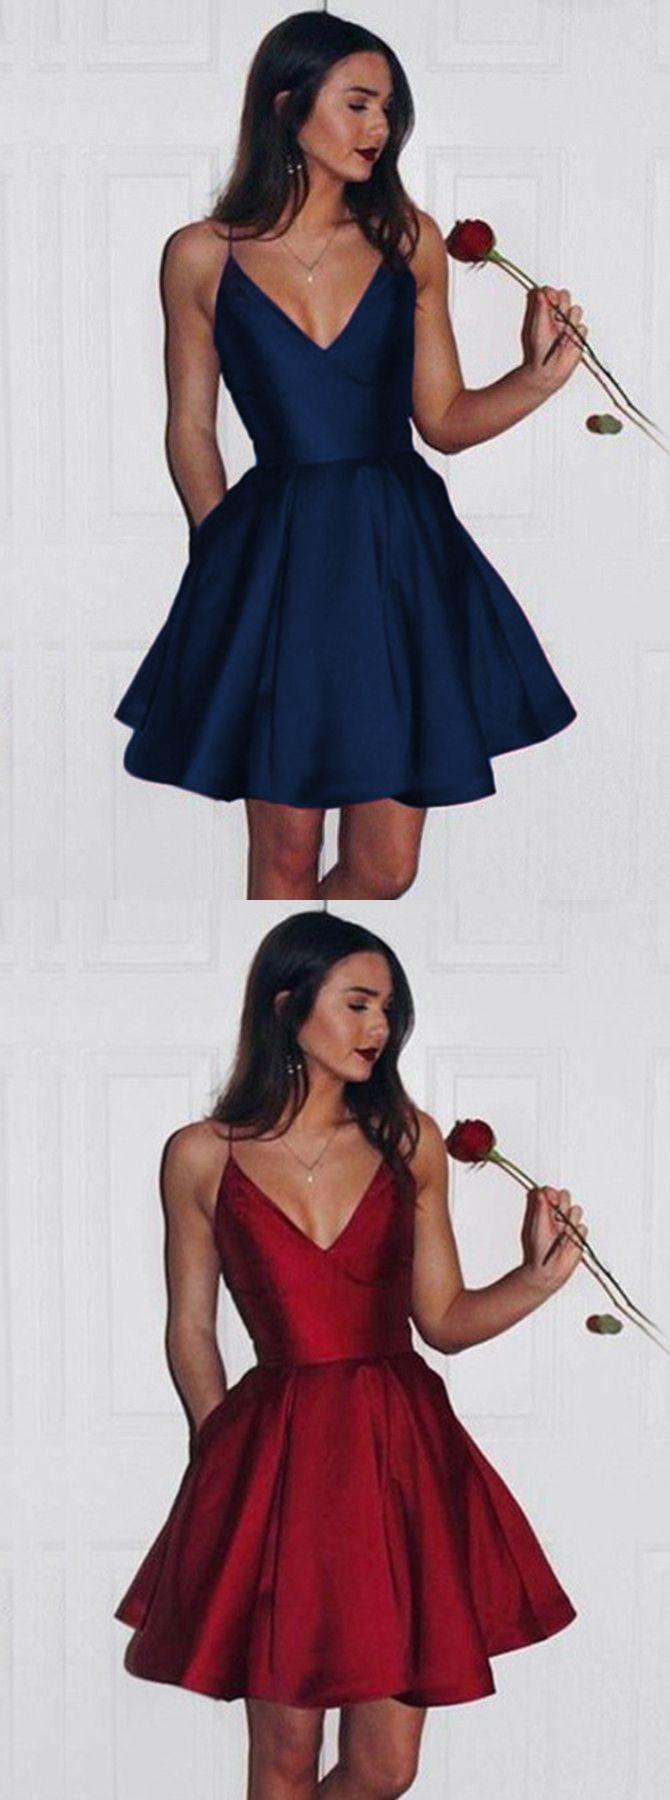 Aline deep vneck short sleeveless dark red satin homecoming dress